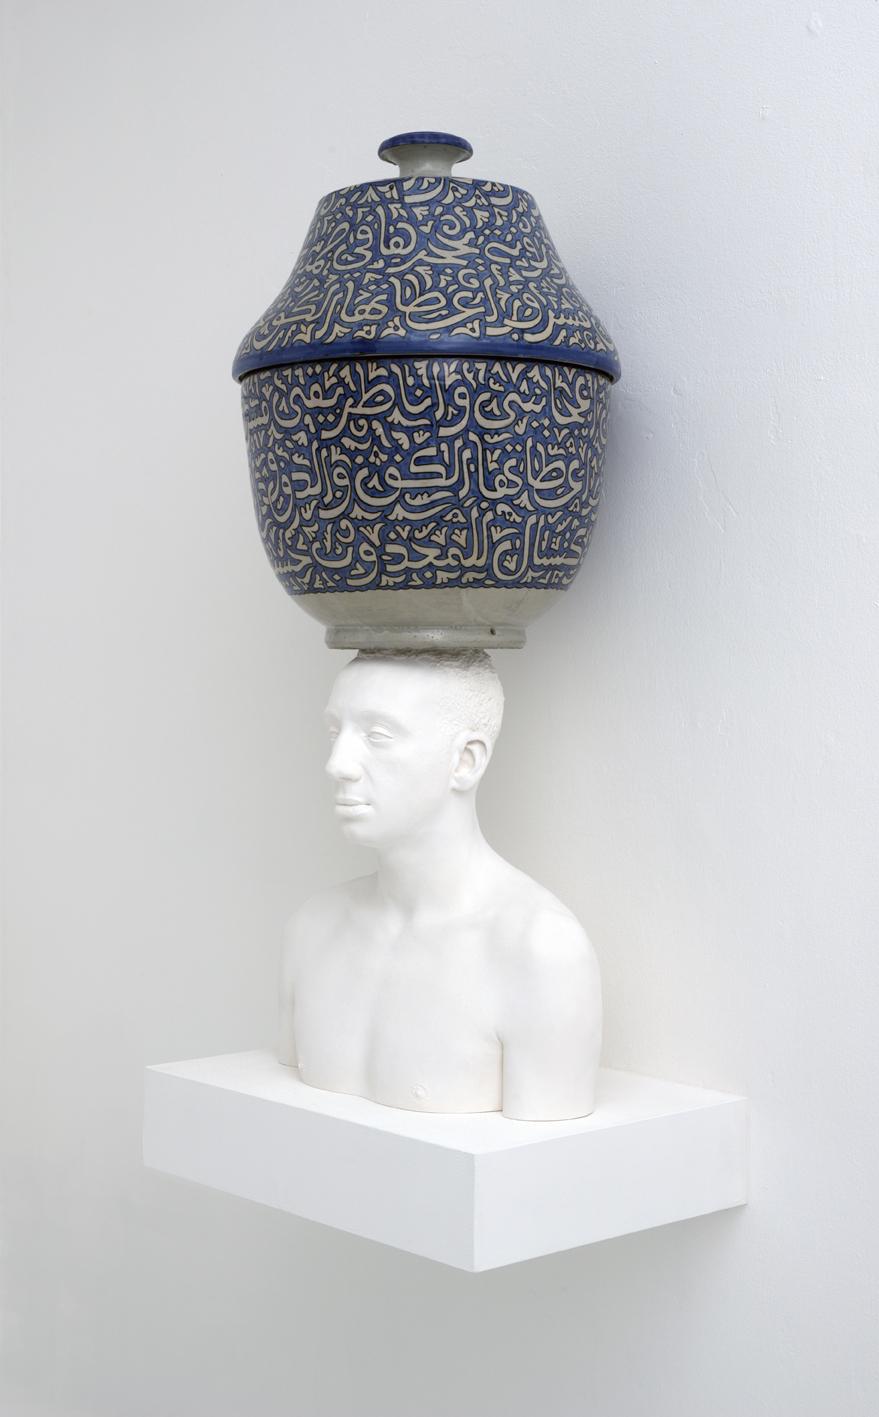 Mehdi-Georges Lahlou, Equilibre au Vase, 2012 - Courtesy the artist and Rabouan Moussion Gallery Paris